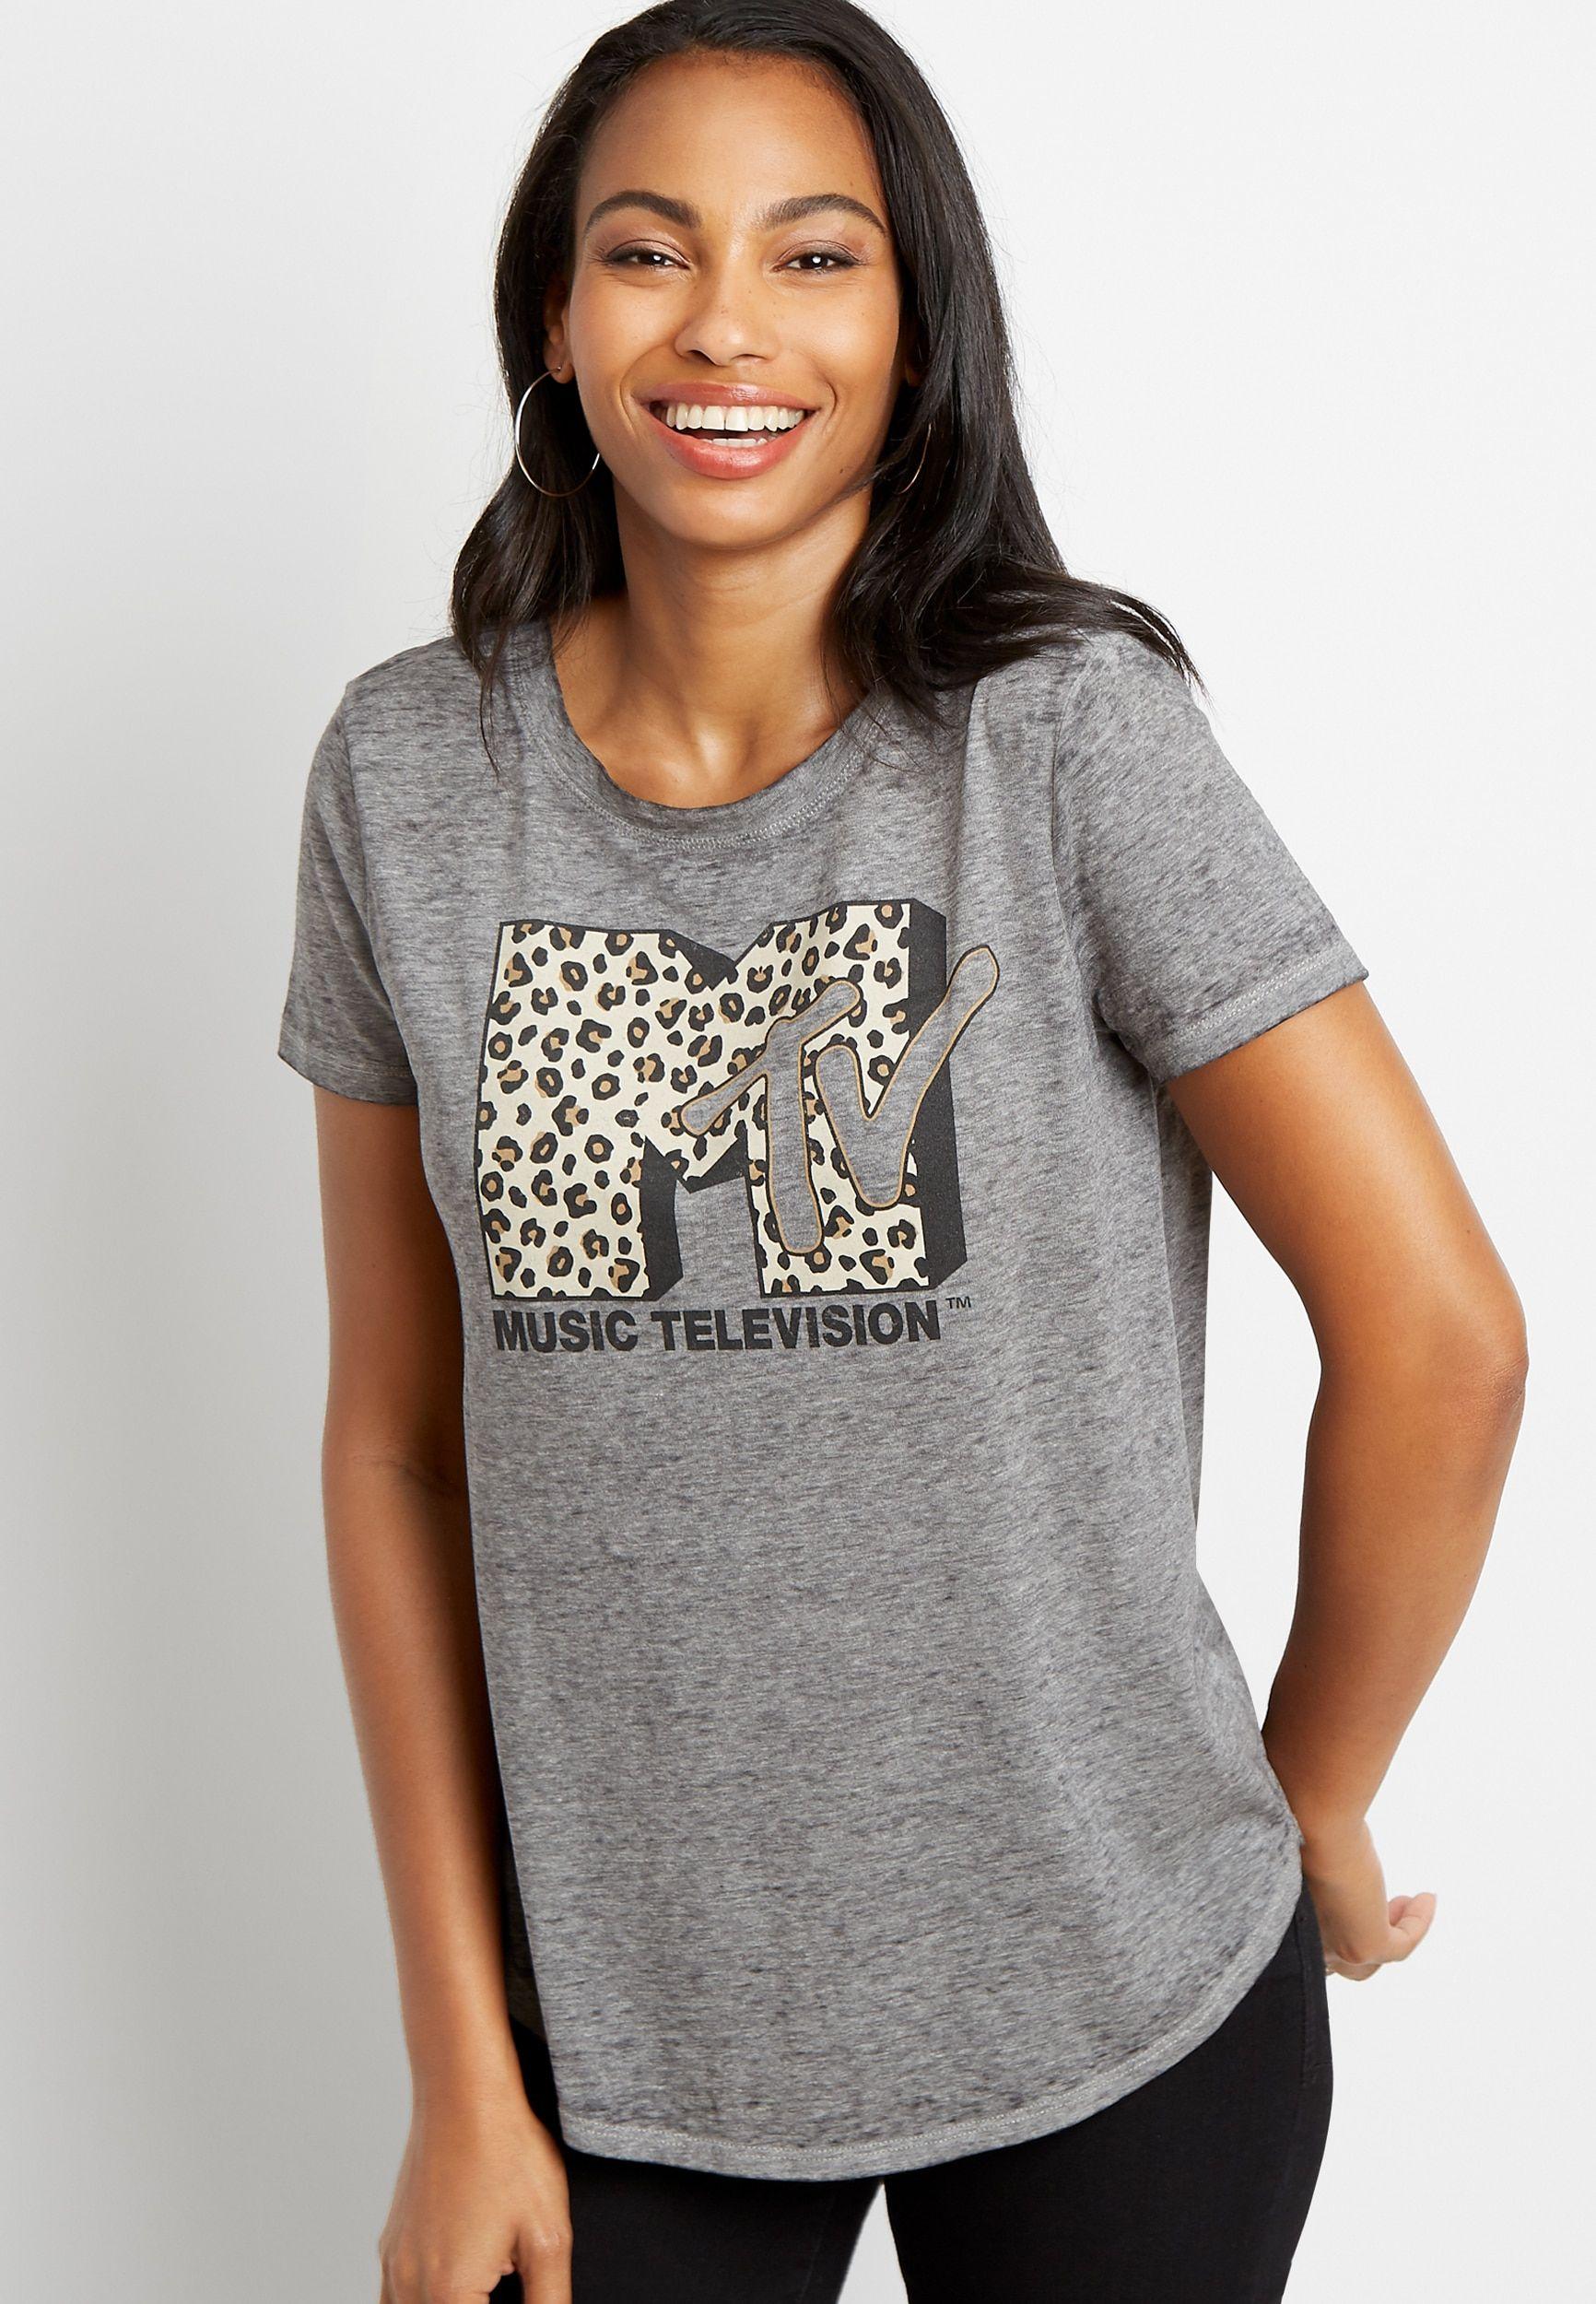 MTVs Leopard  Graphic Tee   T-shirt  Top  Band Tee